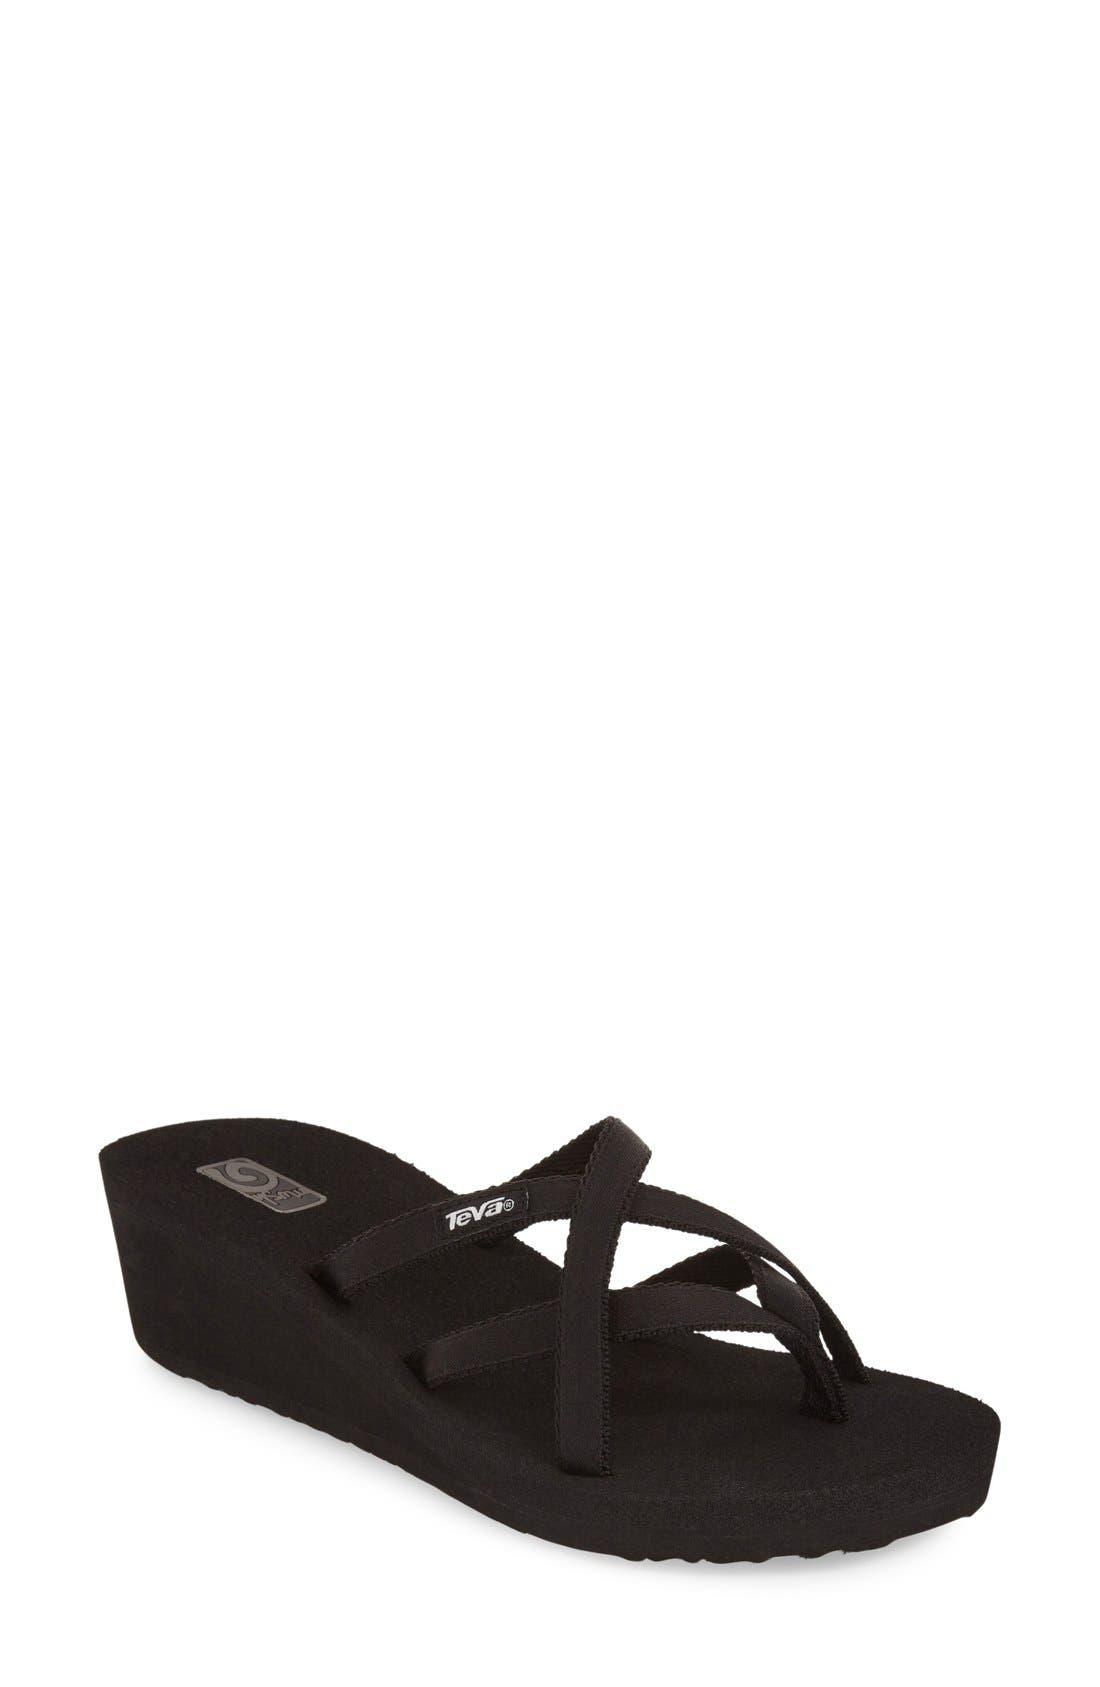 'Mandalyn' Wedge Sandal,                         Main,                         color, Black